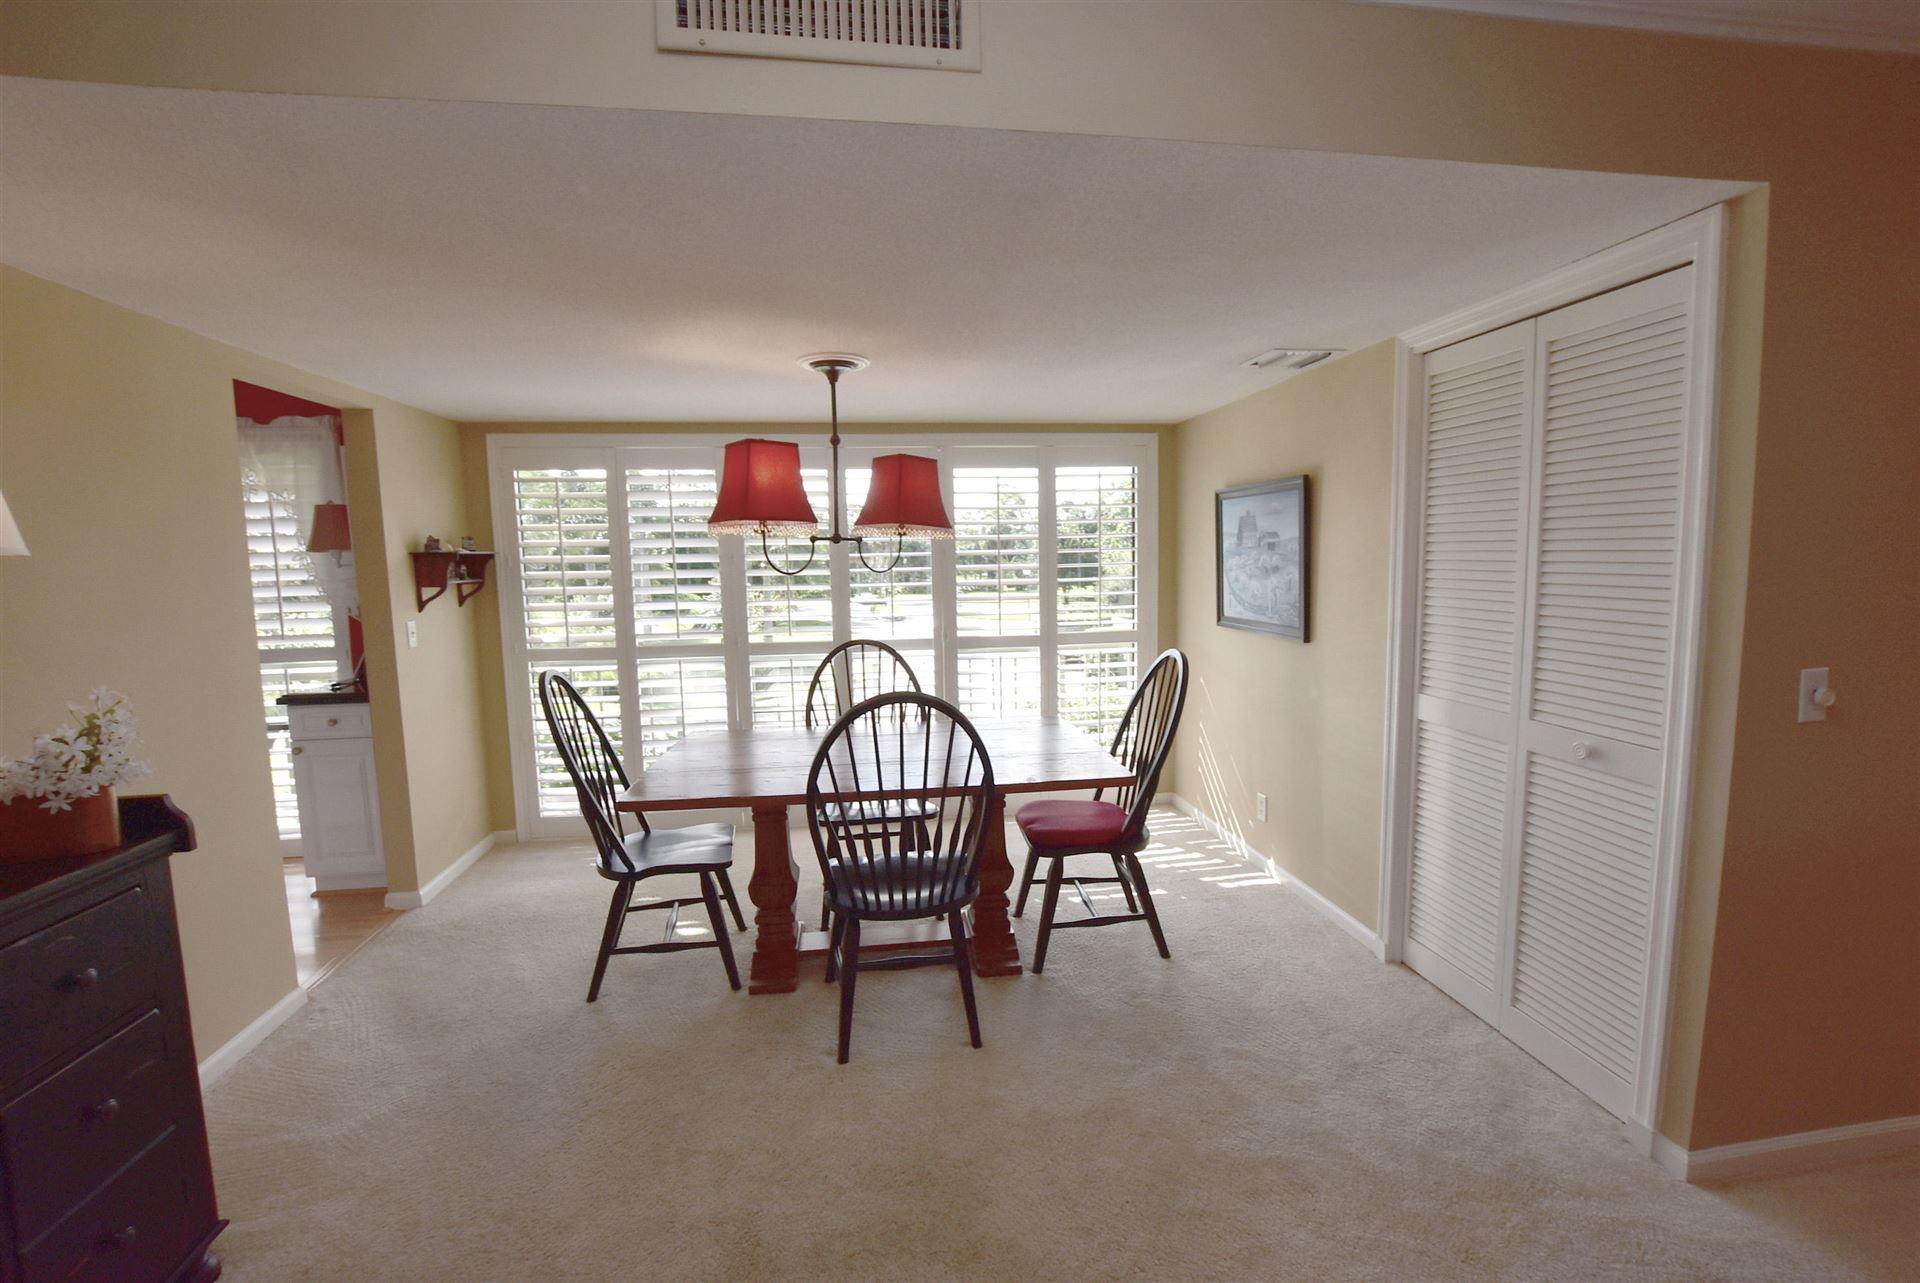 Photo of 4265 B Quail Ridge Drive N #Sandpiper, Boynton Beach, FL 33436 (MLS # RX-10661046)